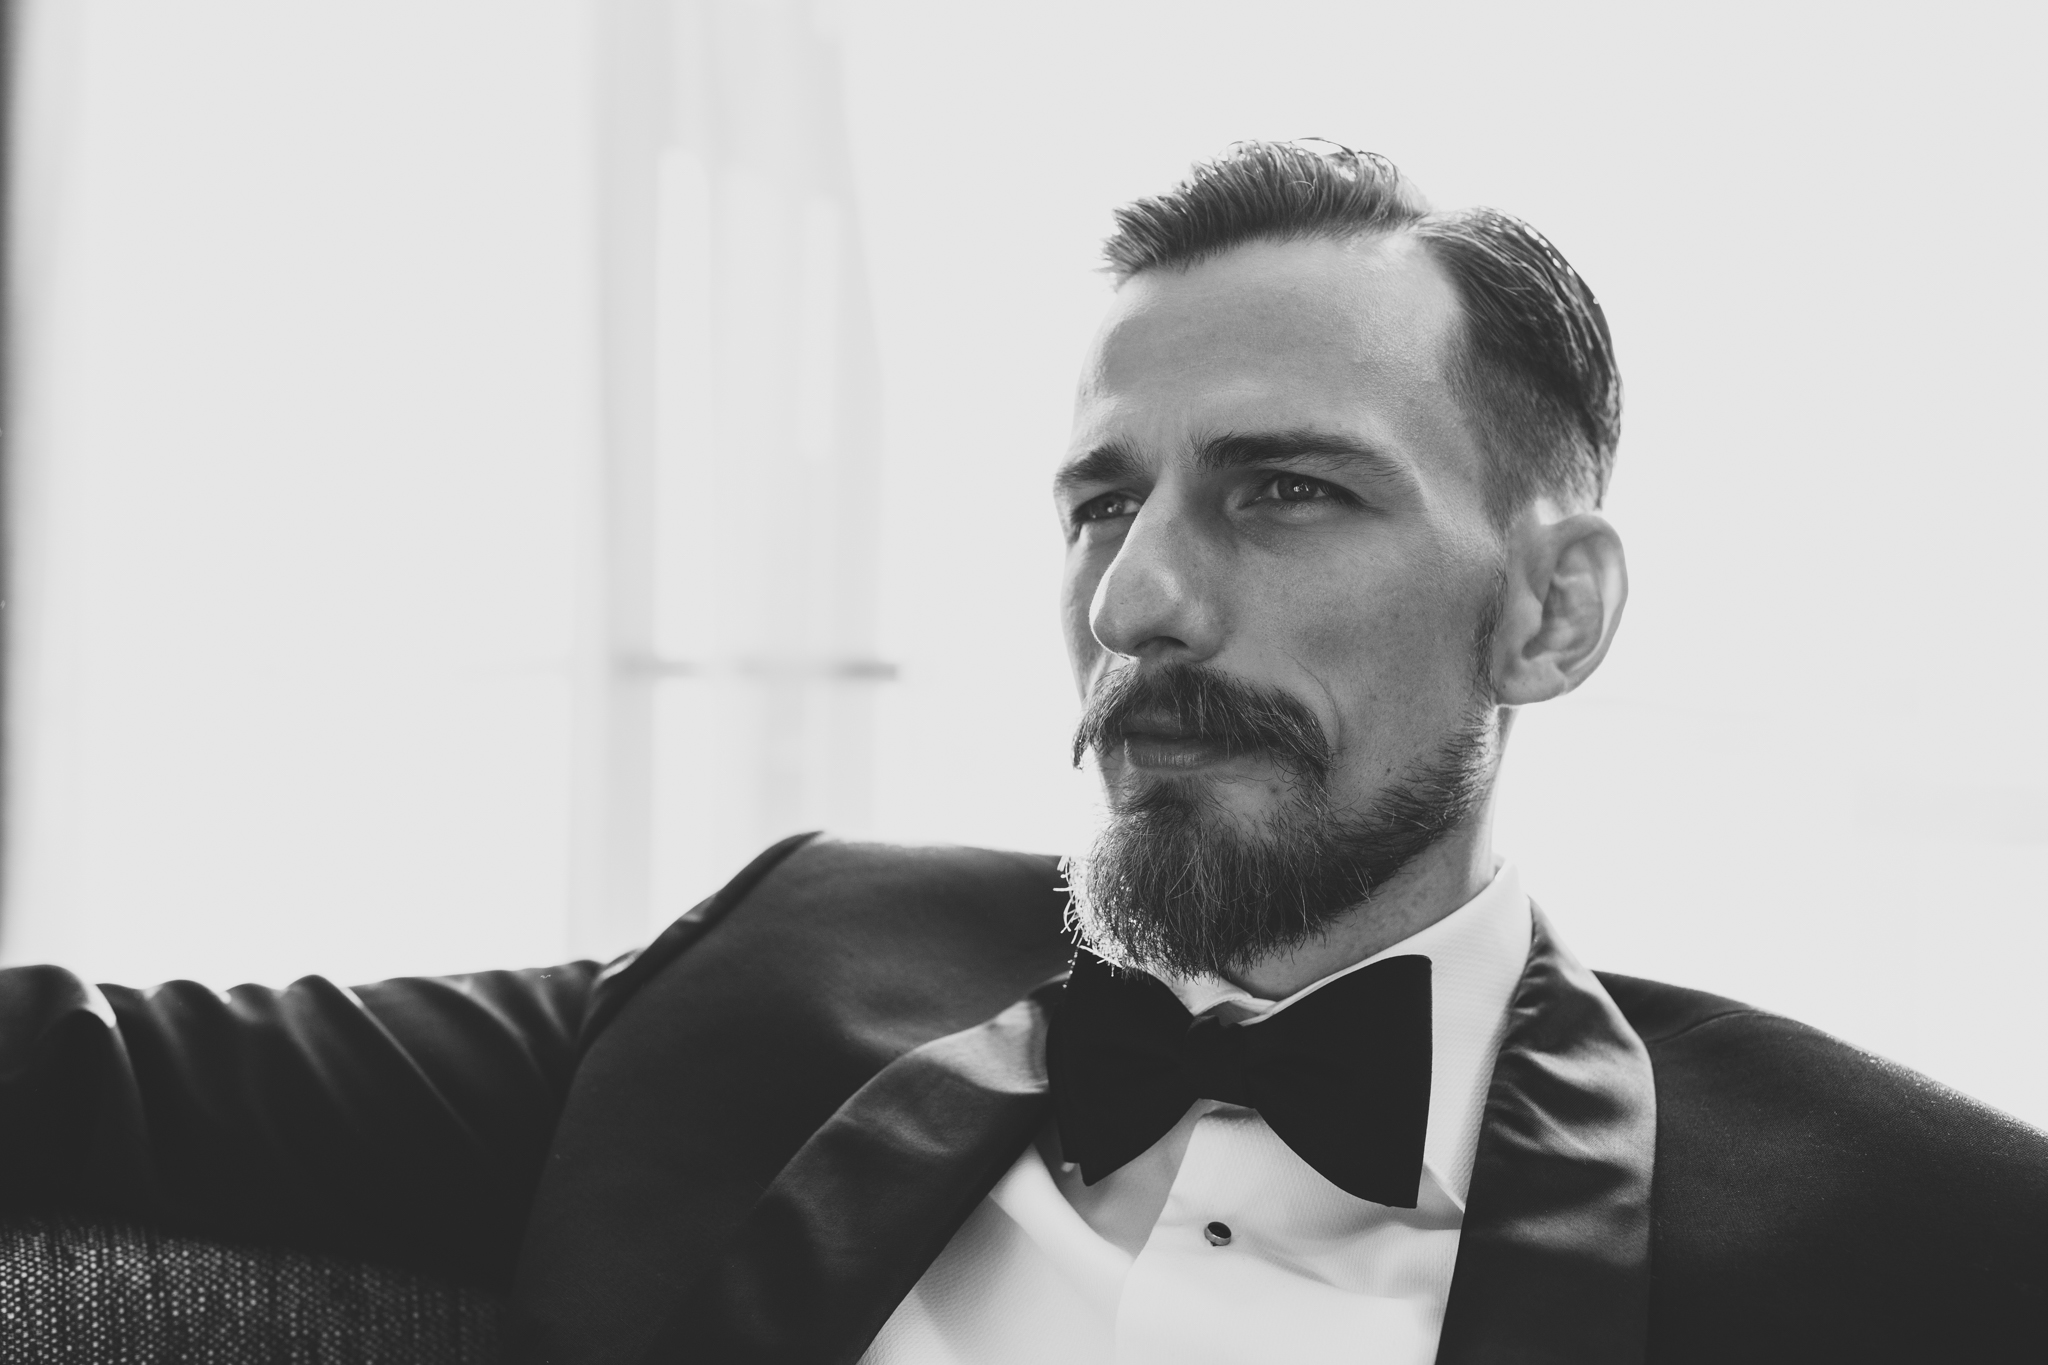 groom looks dapper in tux black and white hj